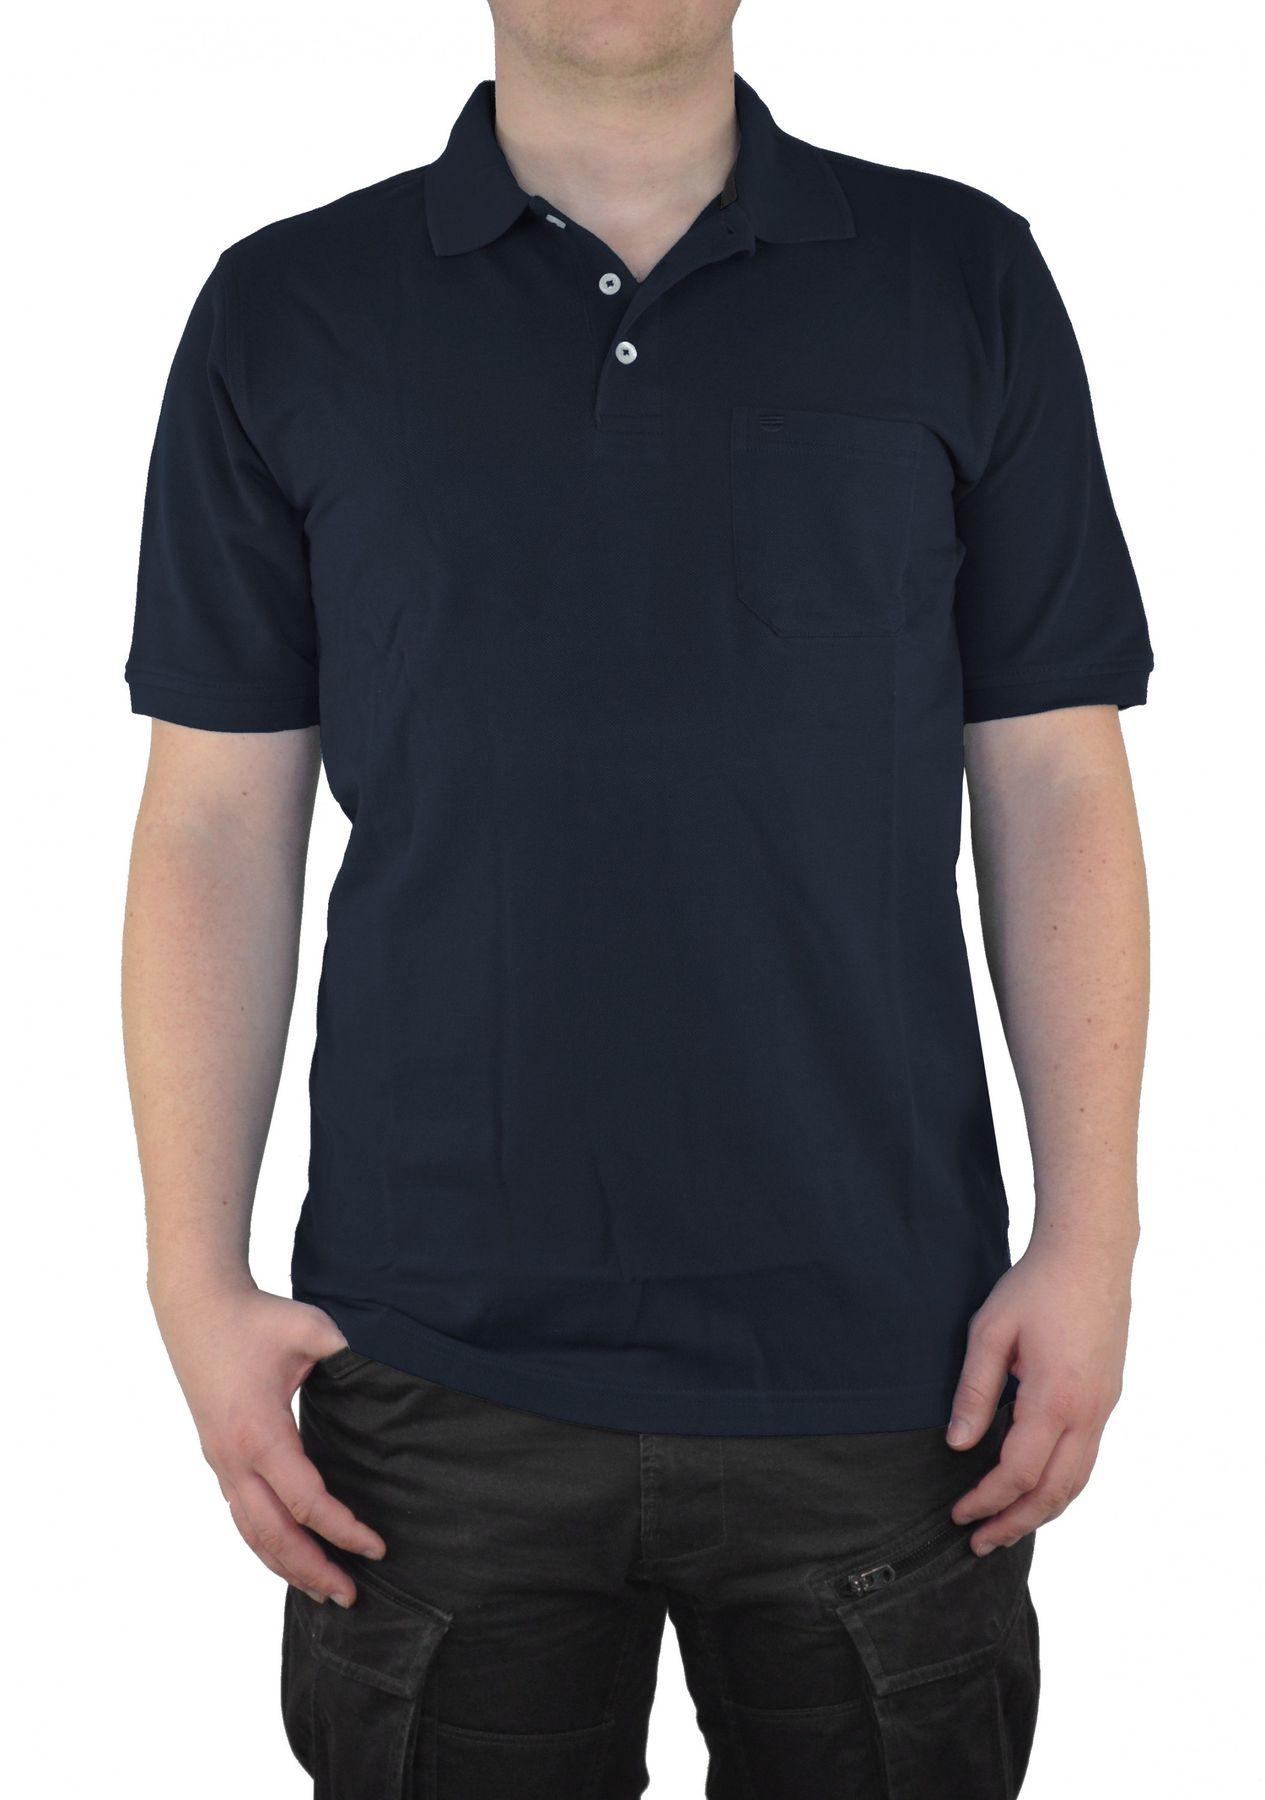 Redmond - Regular Fit - Herren Polo Shirt in verschiedenen Farben (900 A) – Bild 1